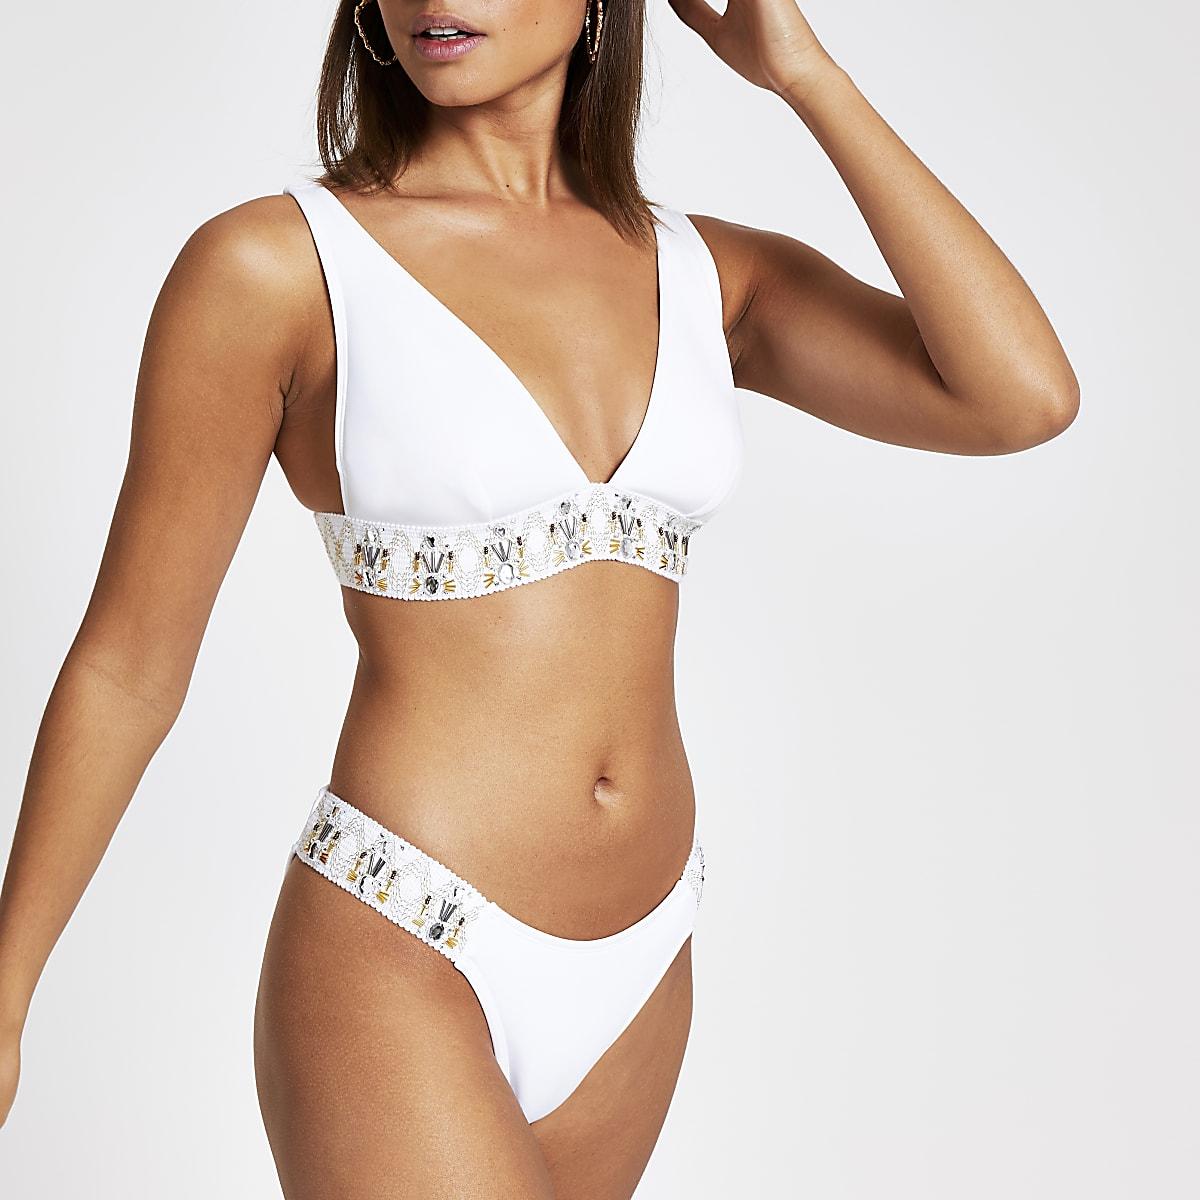 045467d19d5 White embellished high leg bikini bottoms - Bikini Bottoms - Bikinis -  Swimwear & Beachwear - women